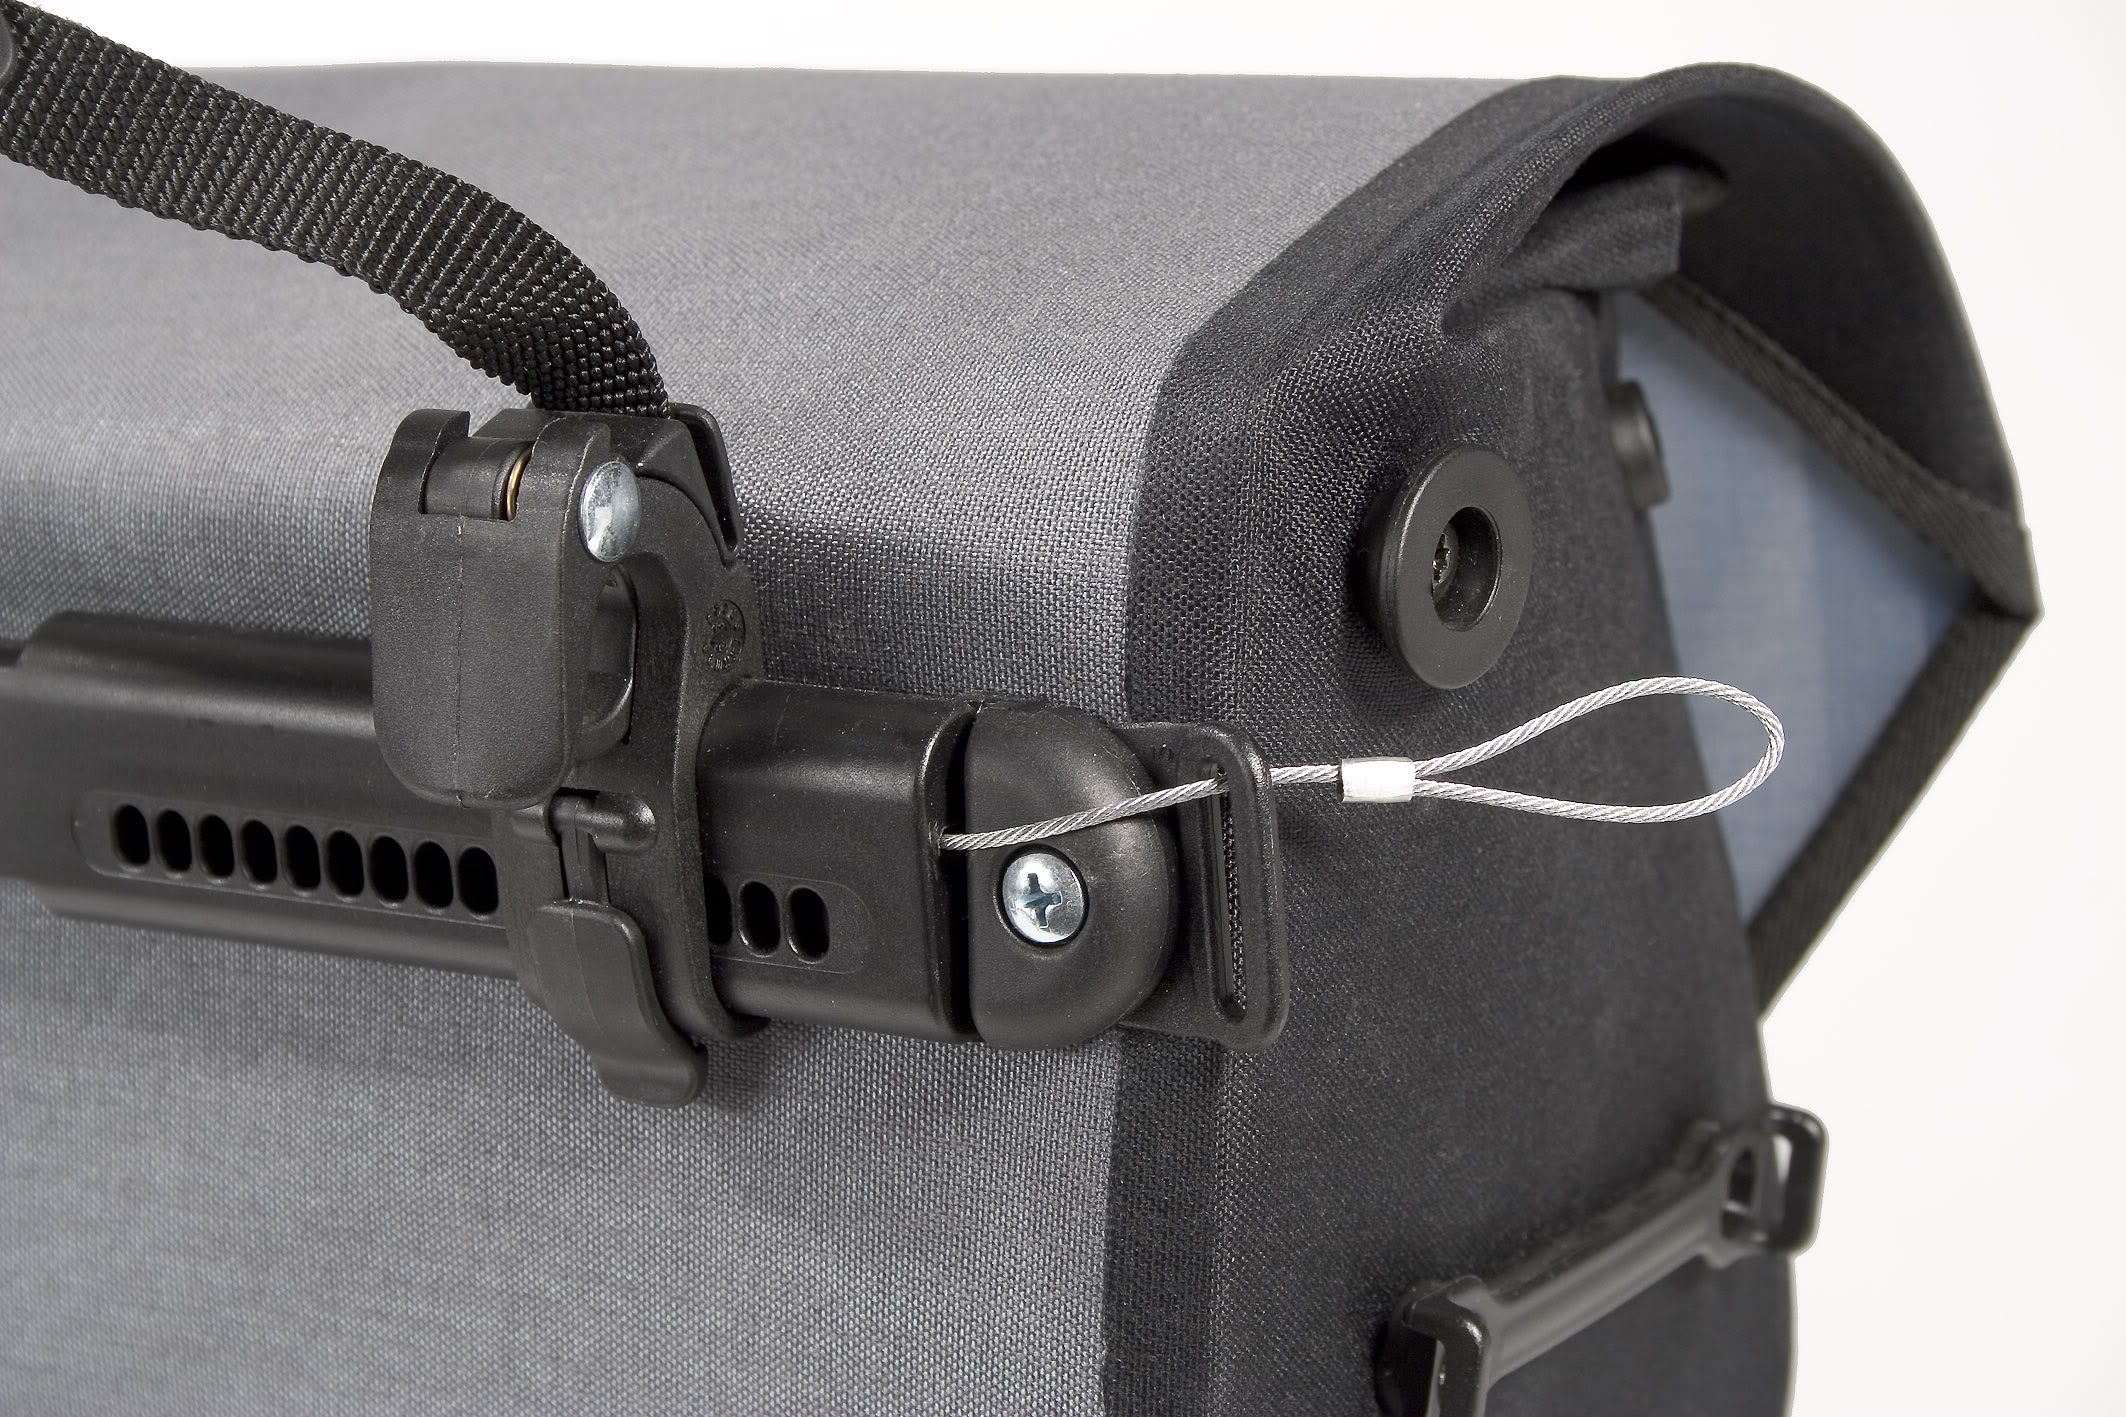 paires de c bles antivols ortlieb. Black Bedroom Furniture Sets. Home Design Ideas